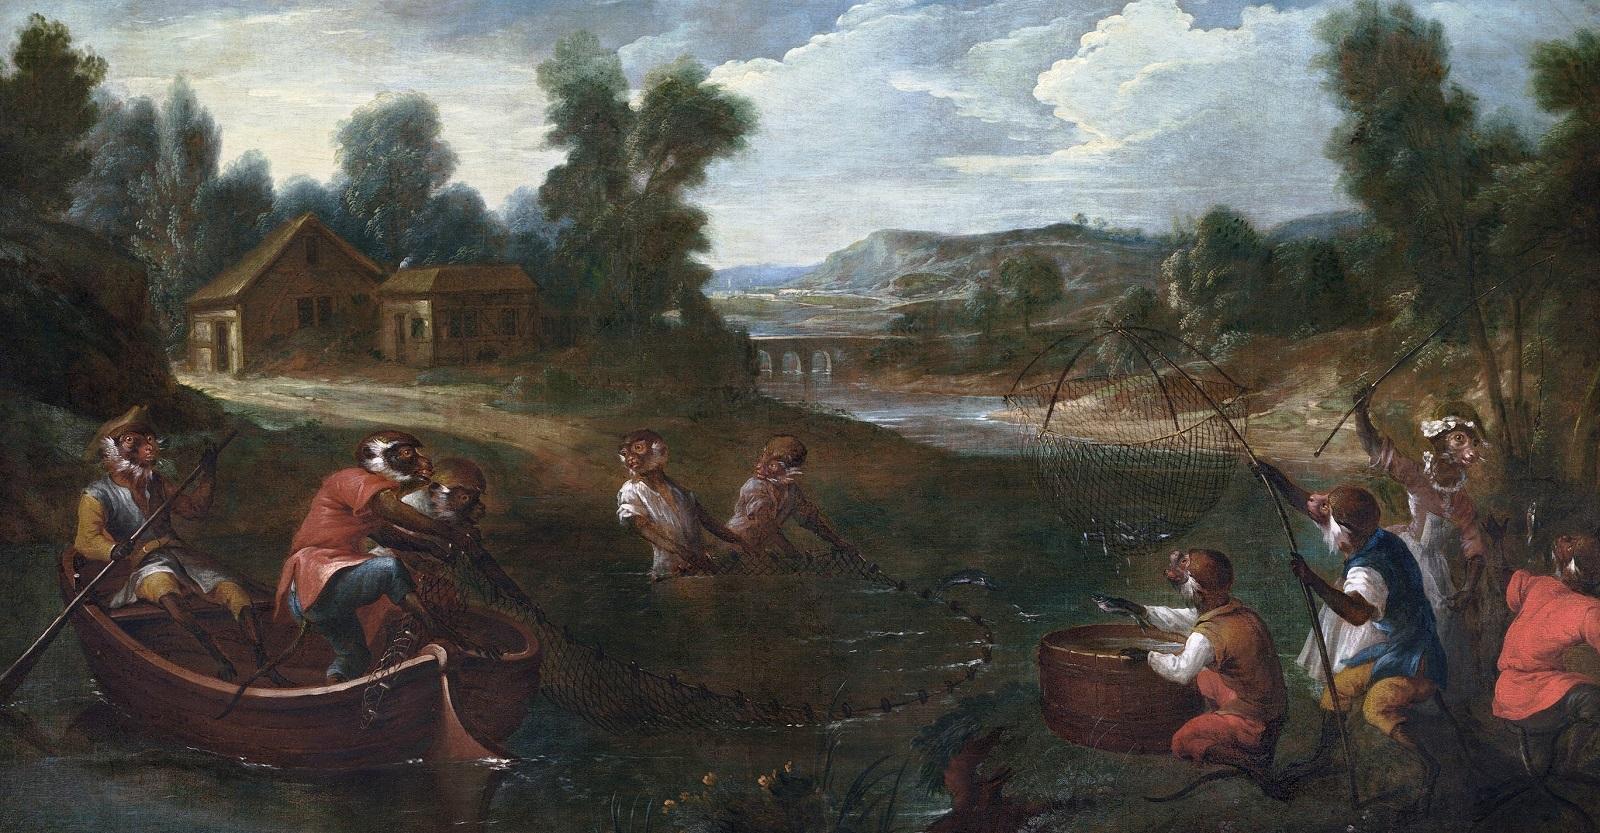 Кристоф Юэ. Обезьянник: рыбаки, ок. 1739.